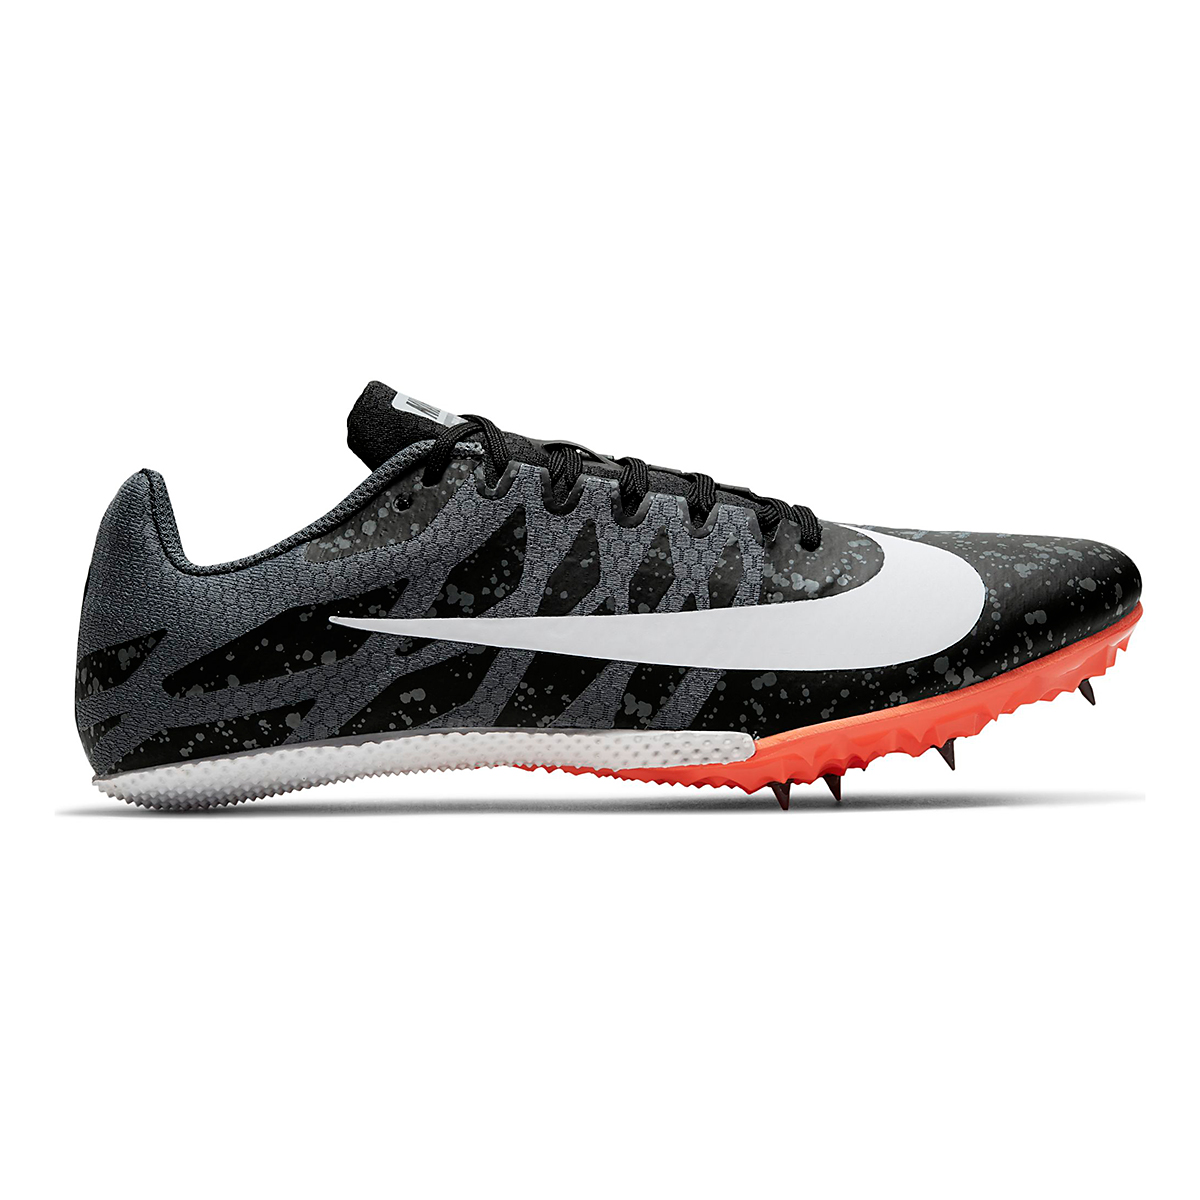 Men's Nike Zoom Rival S 9 Track Spikes - Color: Black/White/Orange - Size: 4 - Width: Regular, Black/White/Orange, large, image 1